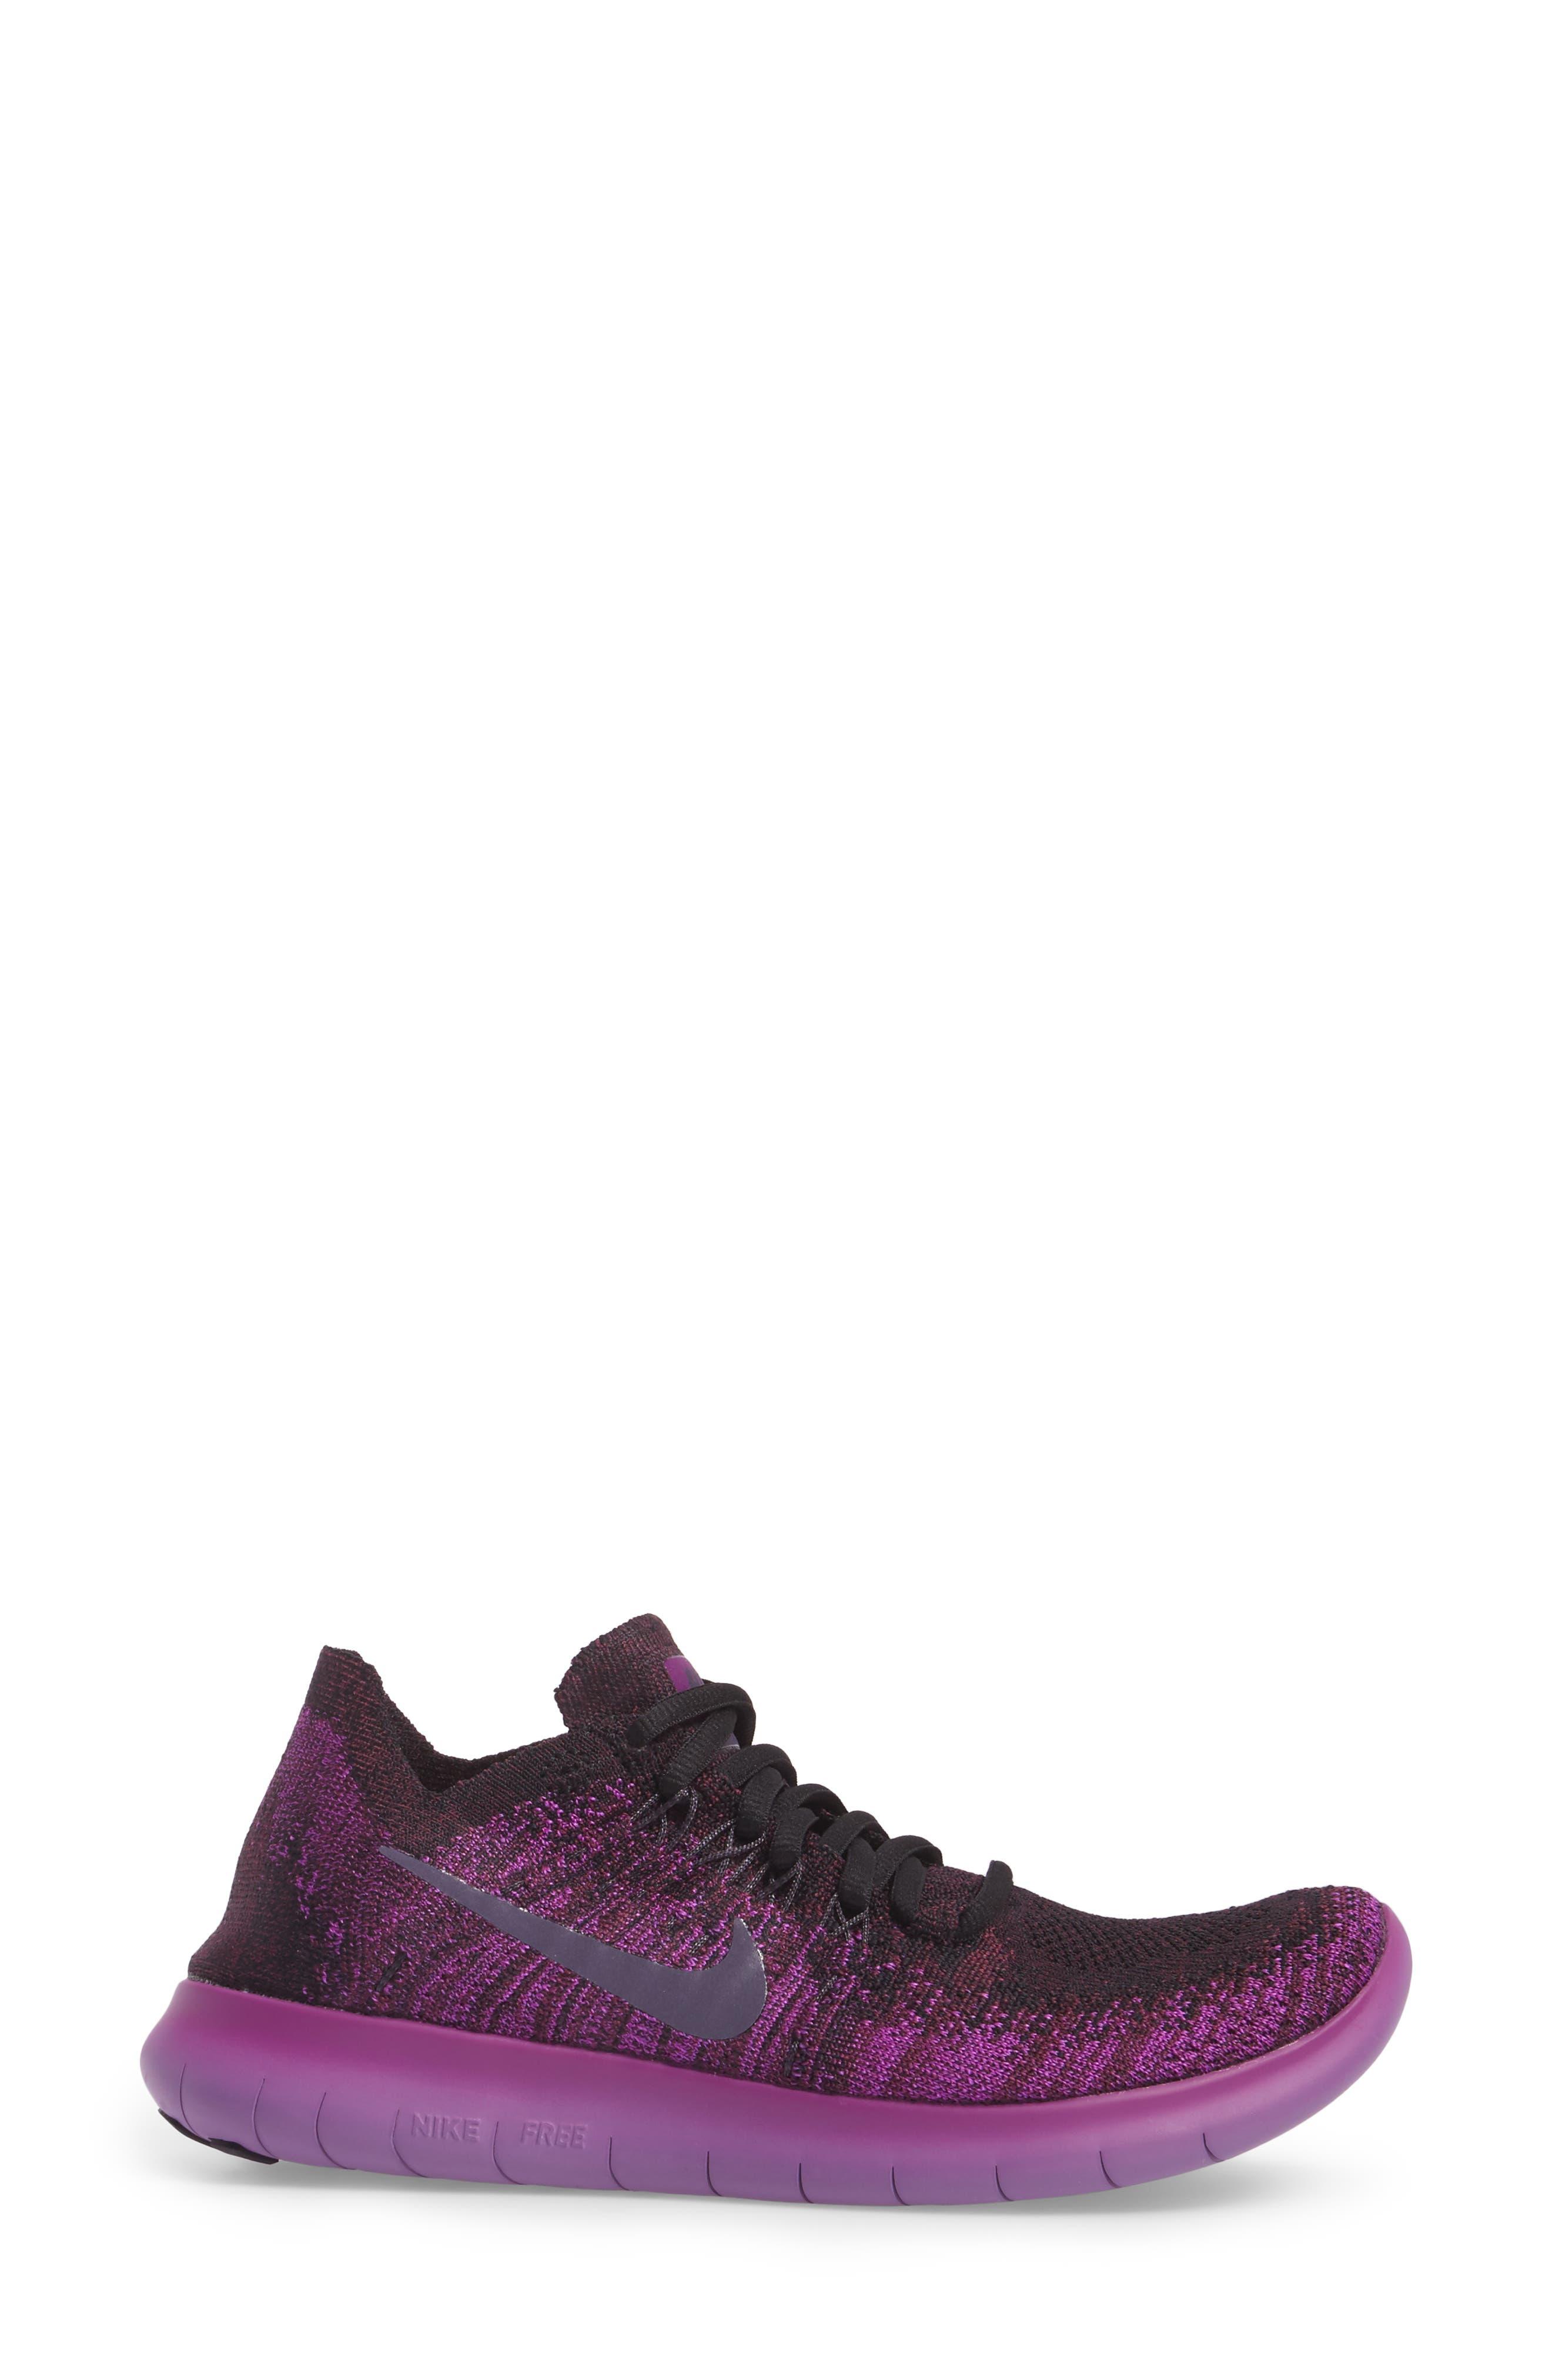 Alternate Image 3  - Nike Free Run Flyknit 2 Running Shoe (Women)